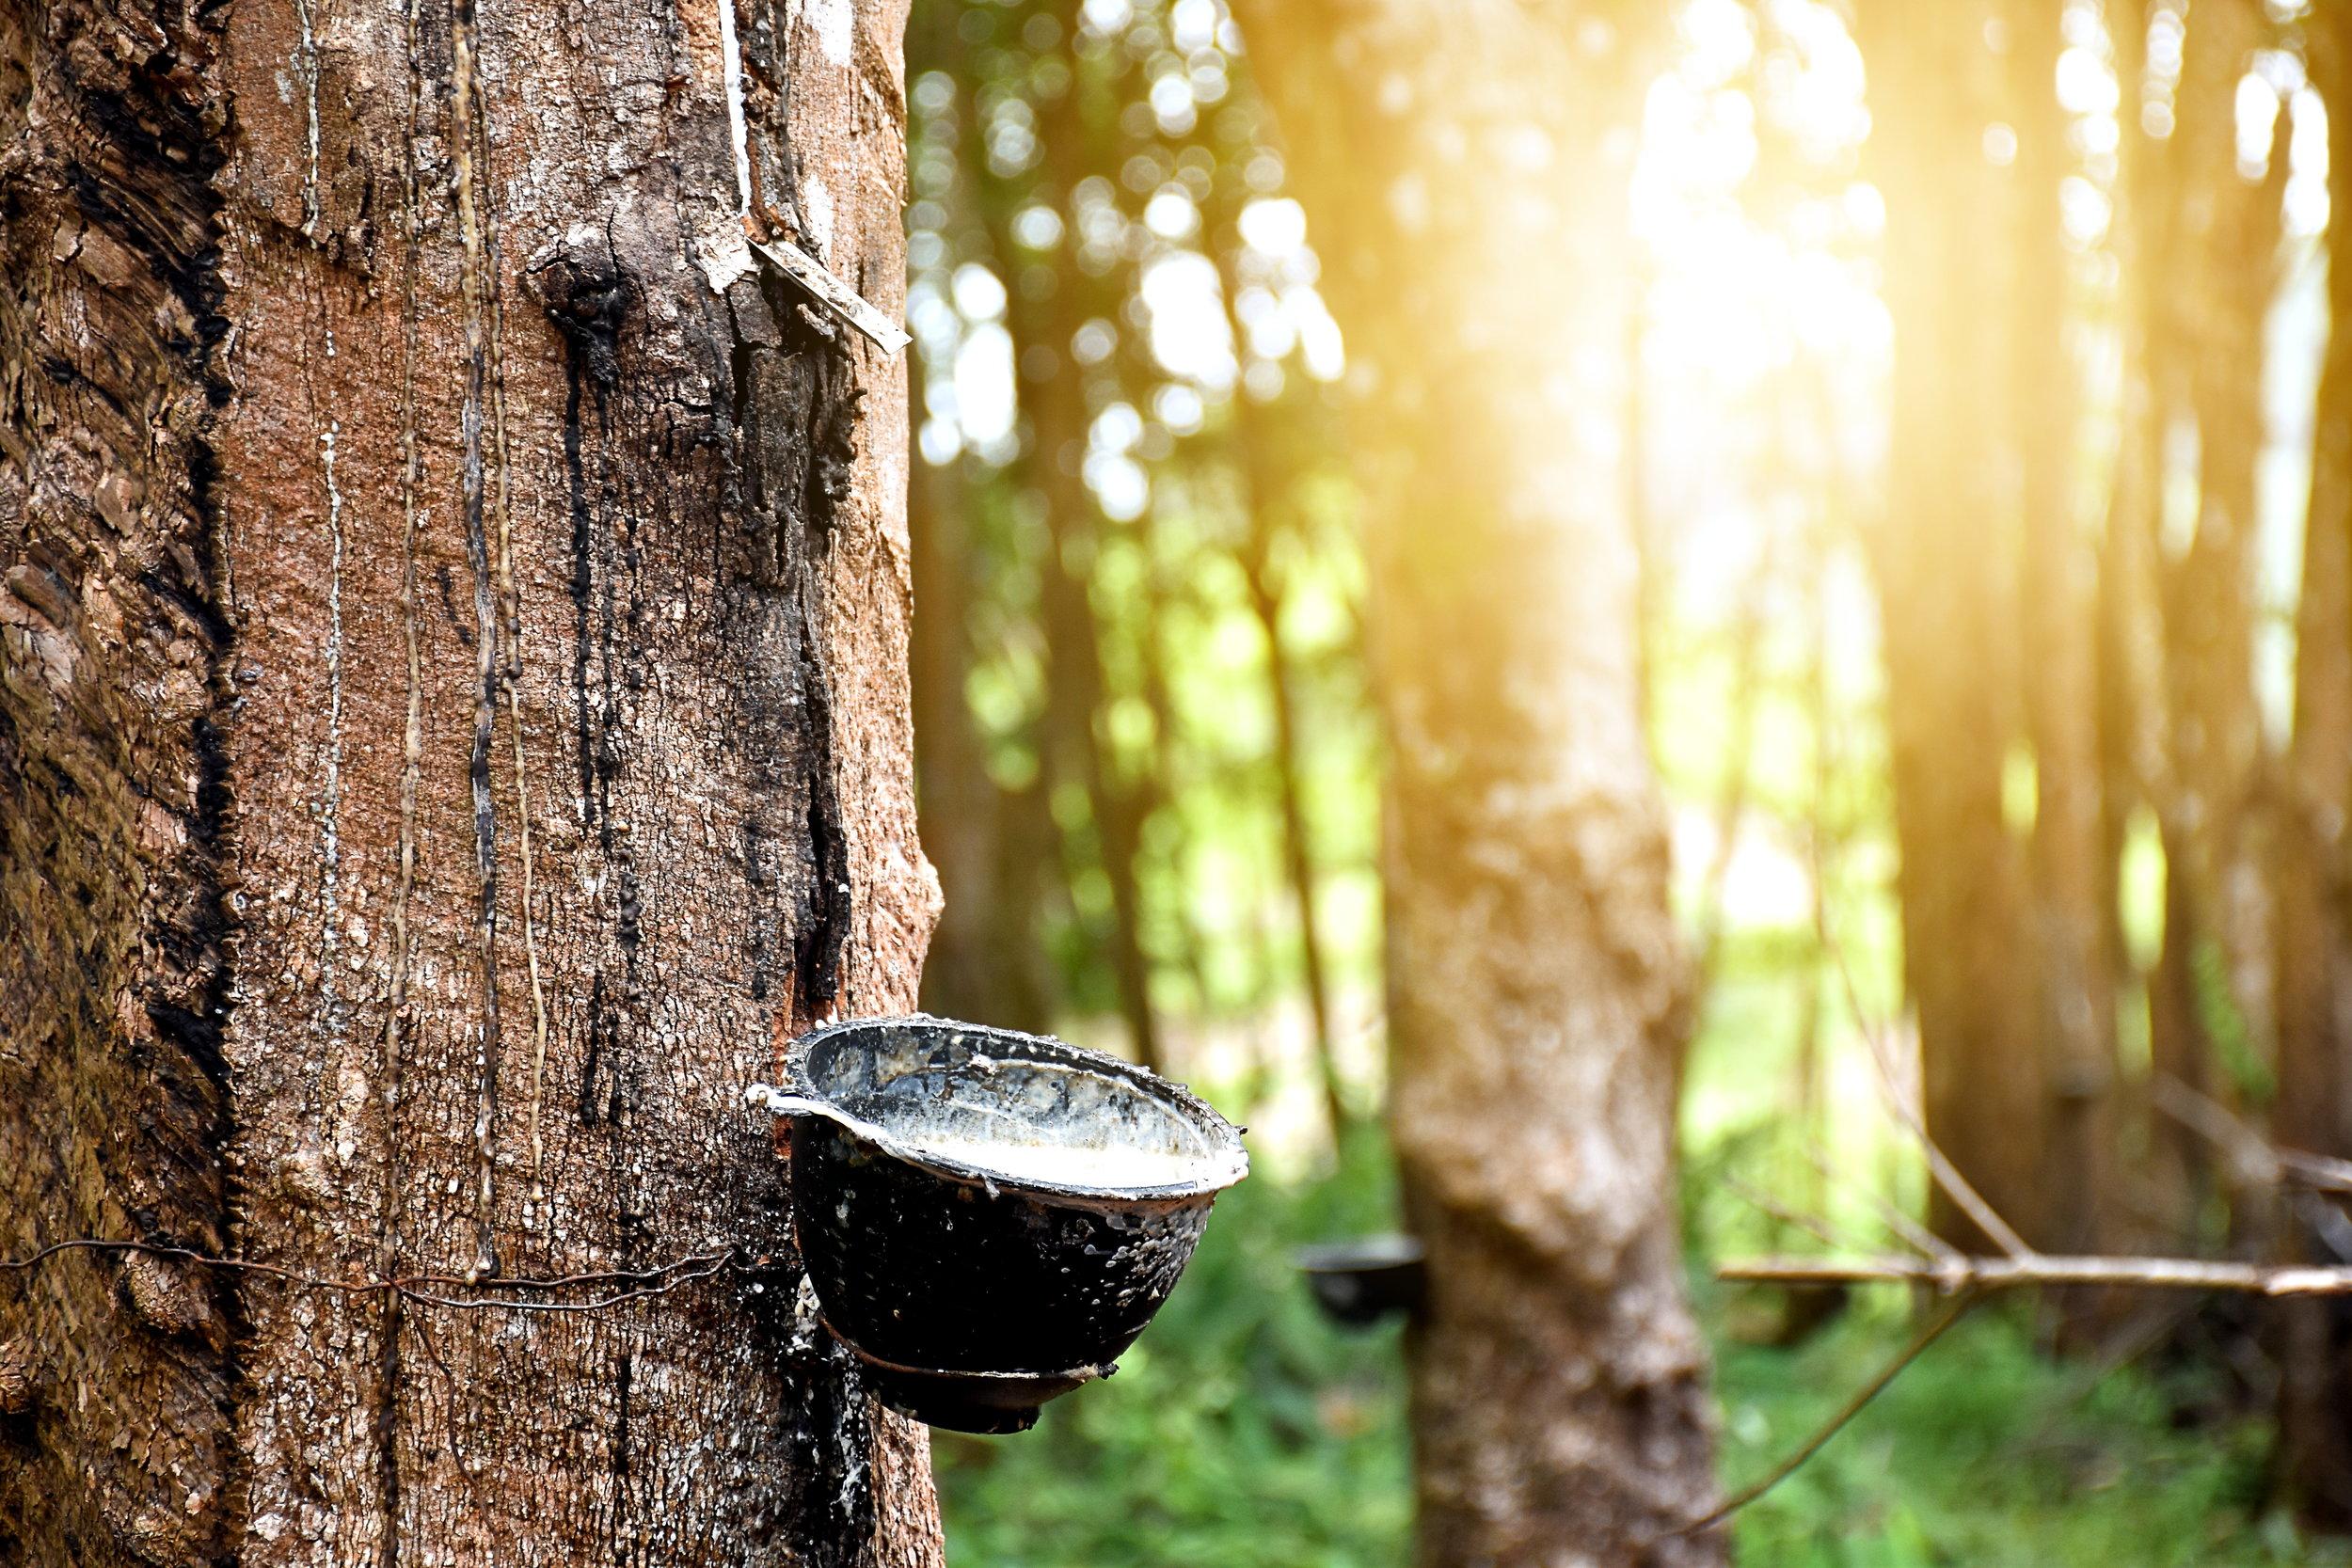 Natural rubber harvesting